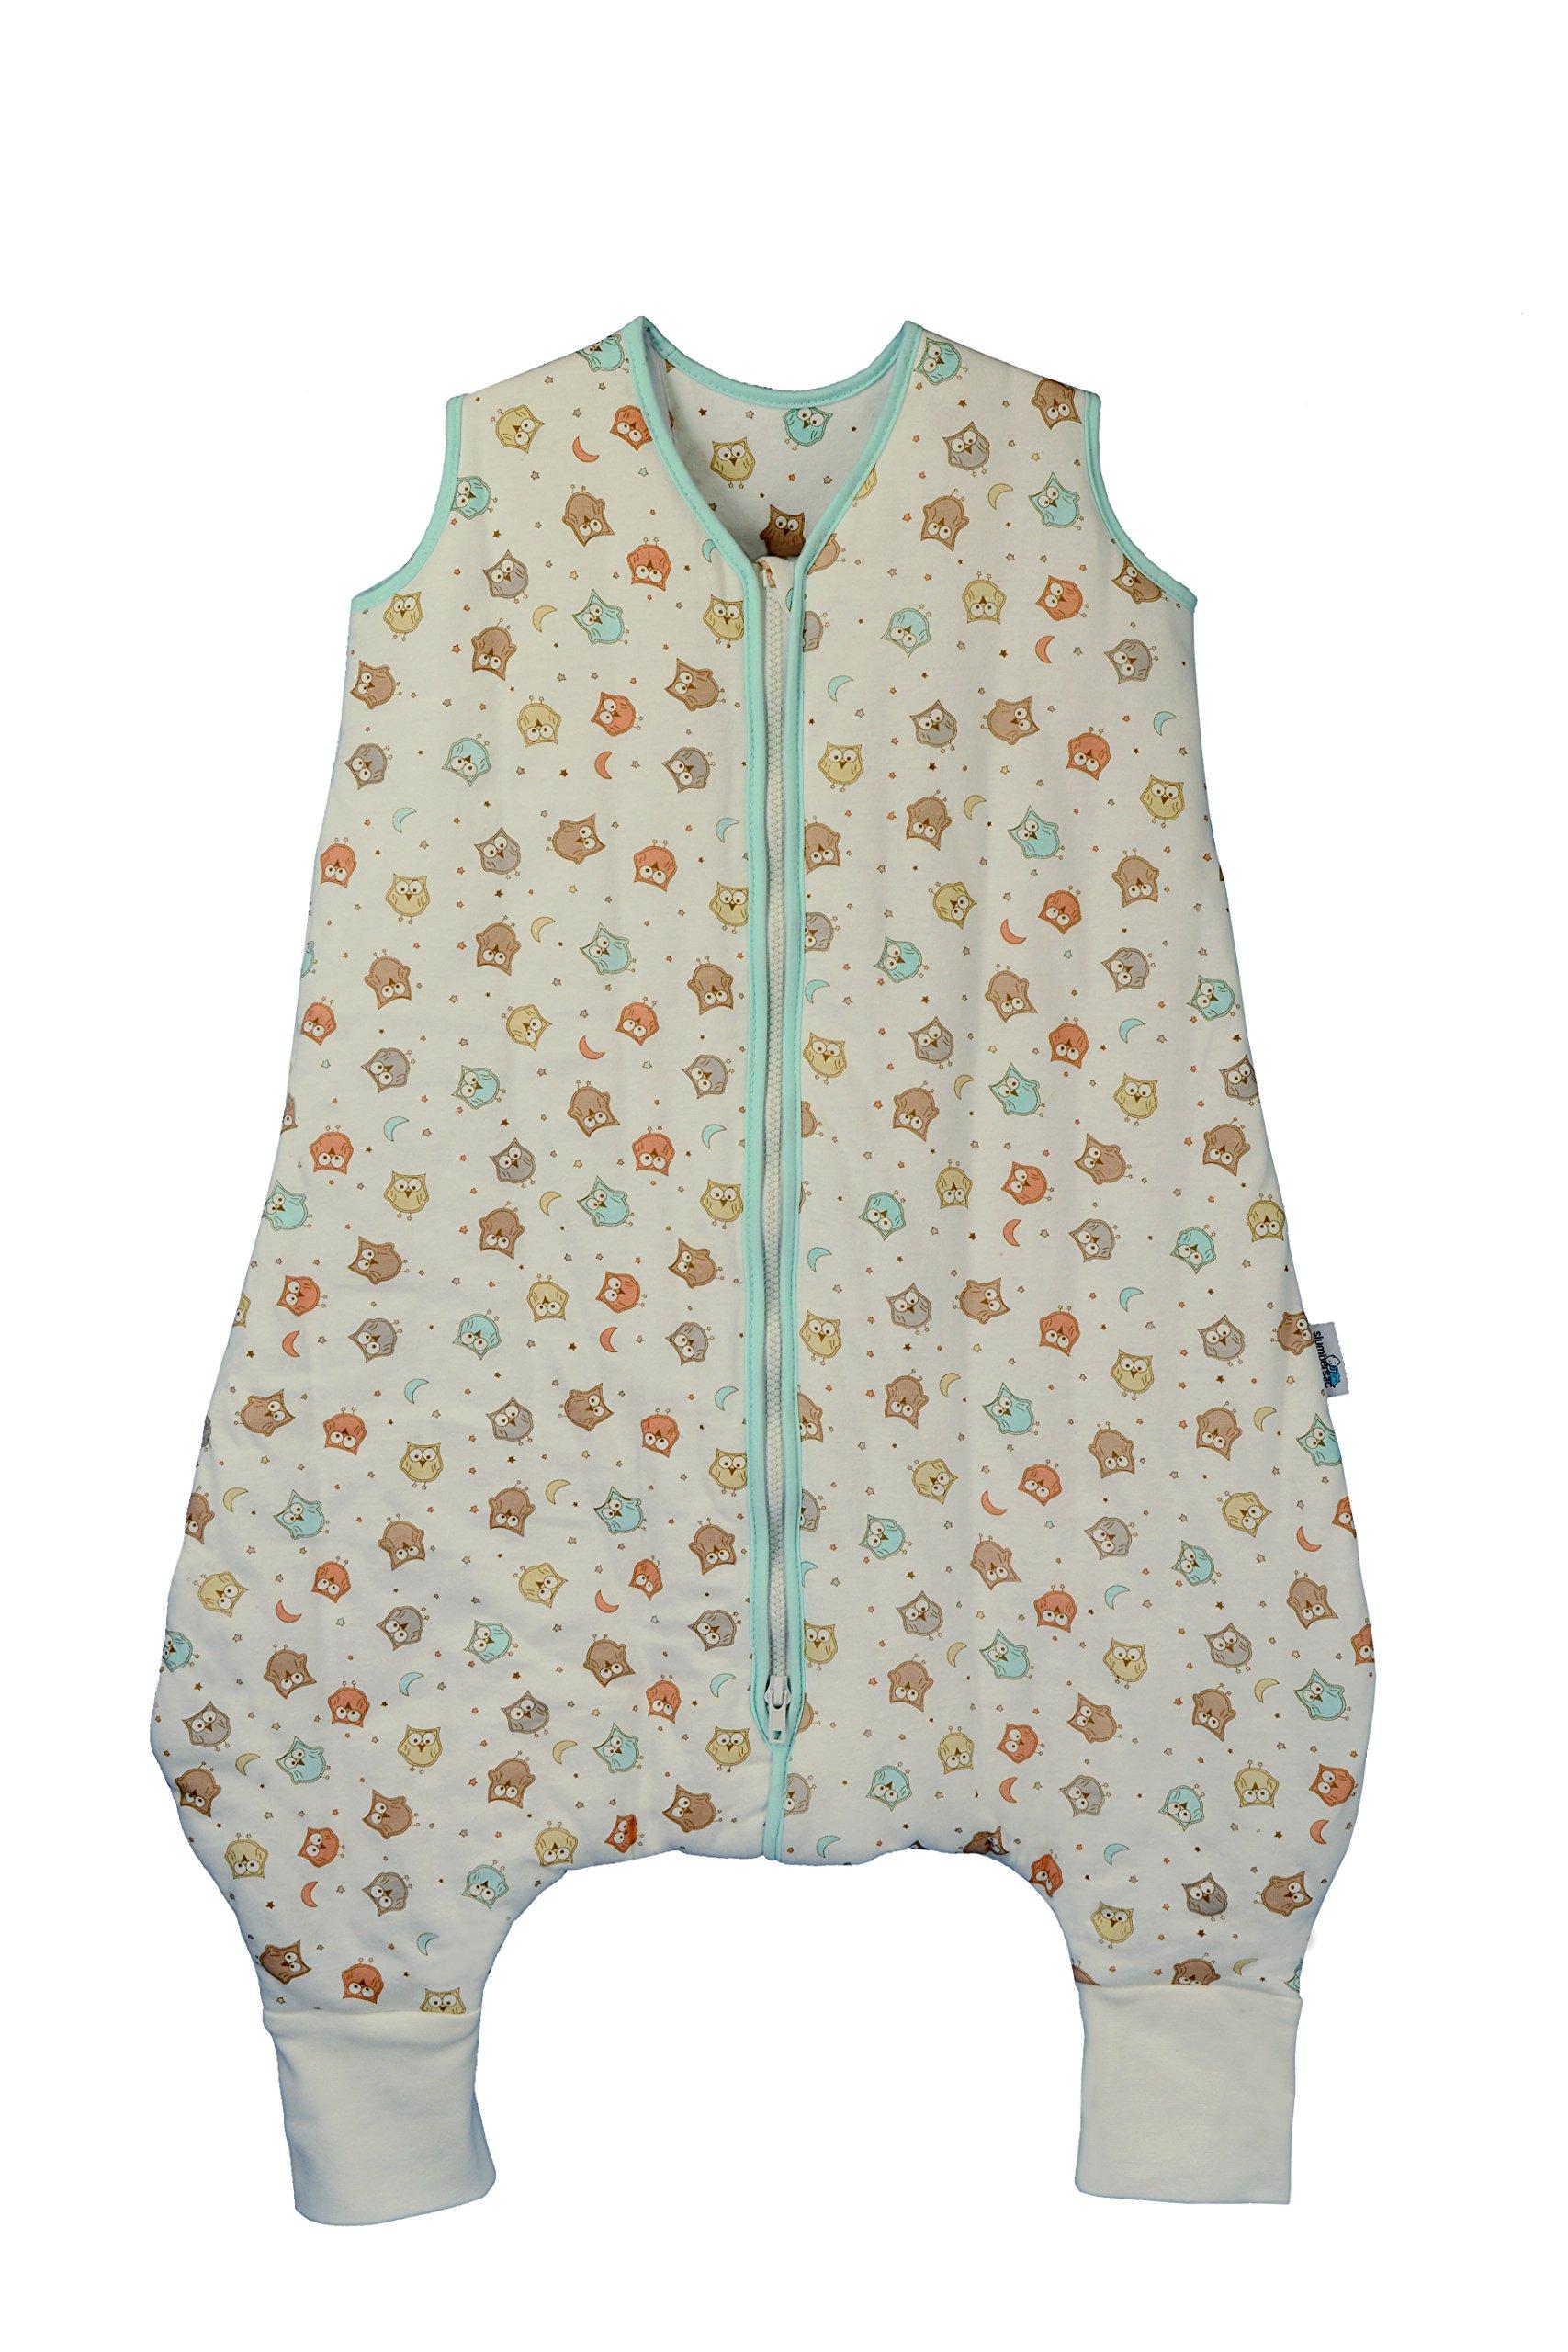 Slumbersafe Summer Sleeping Bag With Feet 1.0 Tog Simply Owl 24-36 months